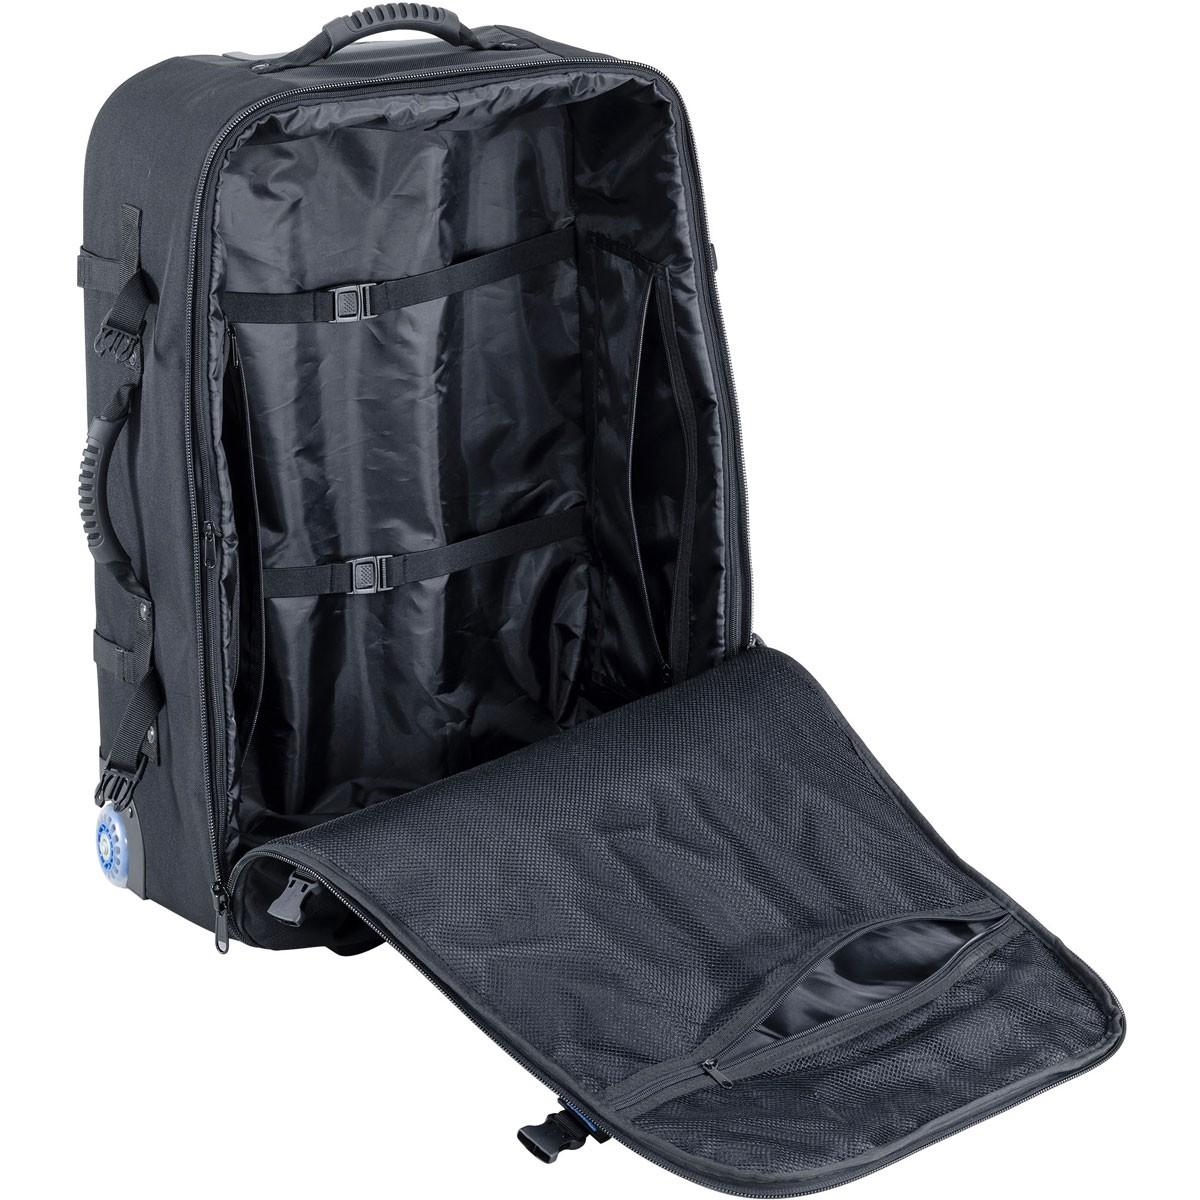 Tusa Roller Bag